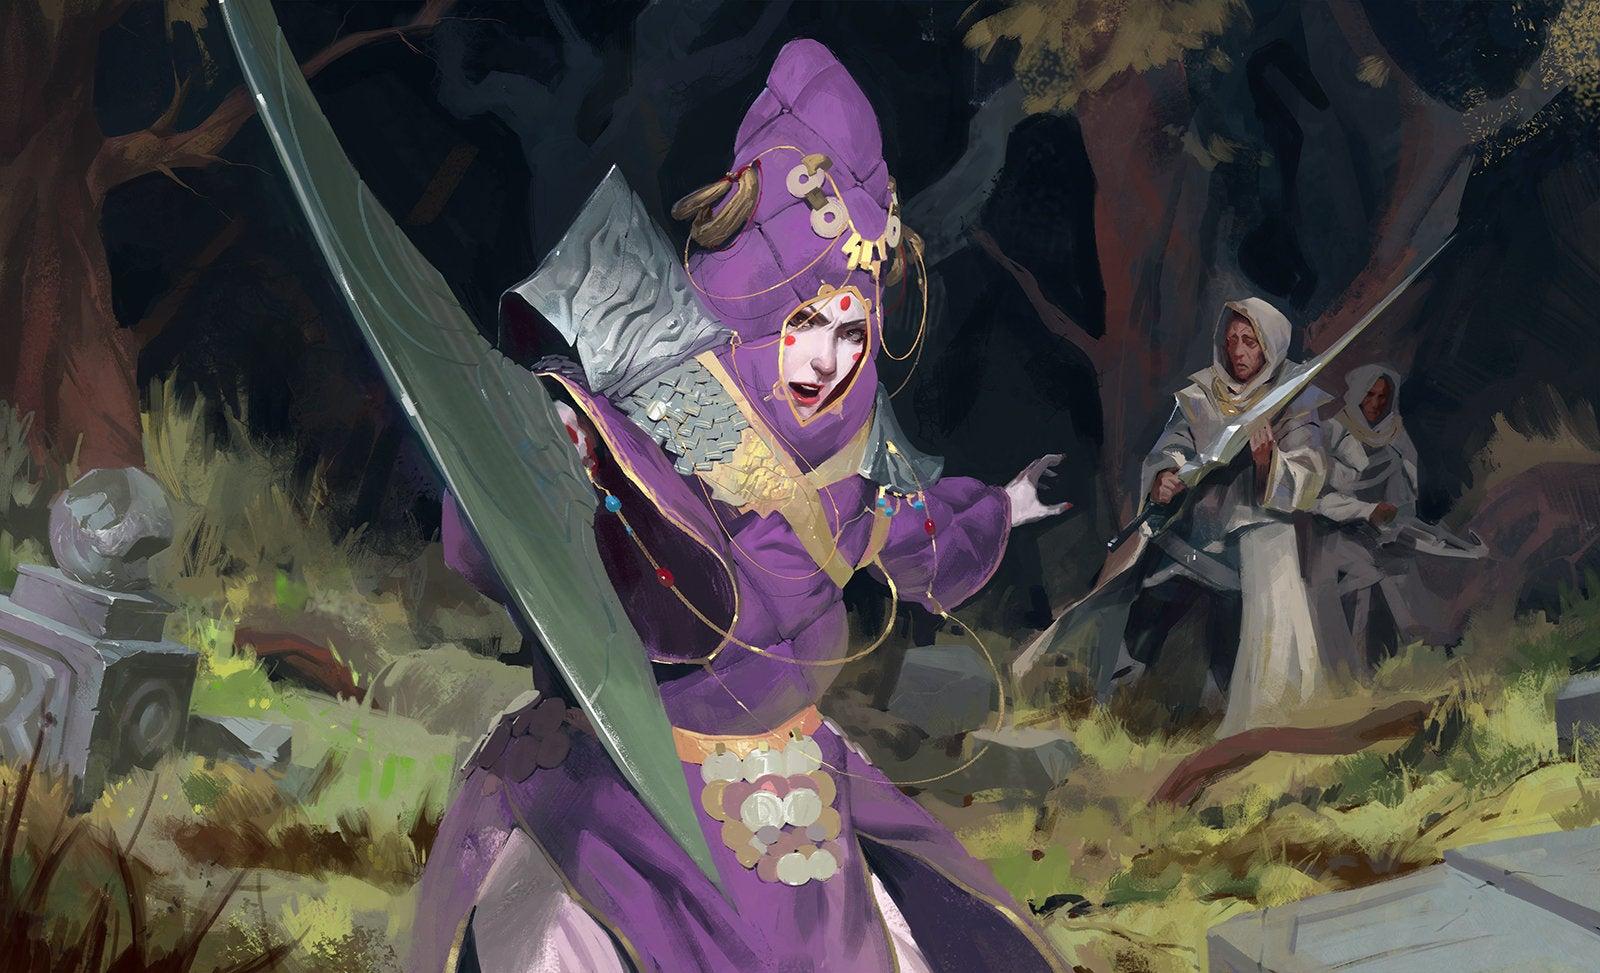 Nice Sword, Clown Lady